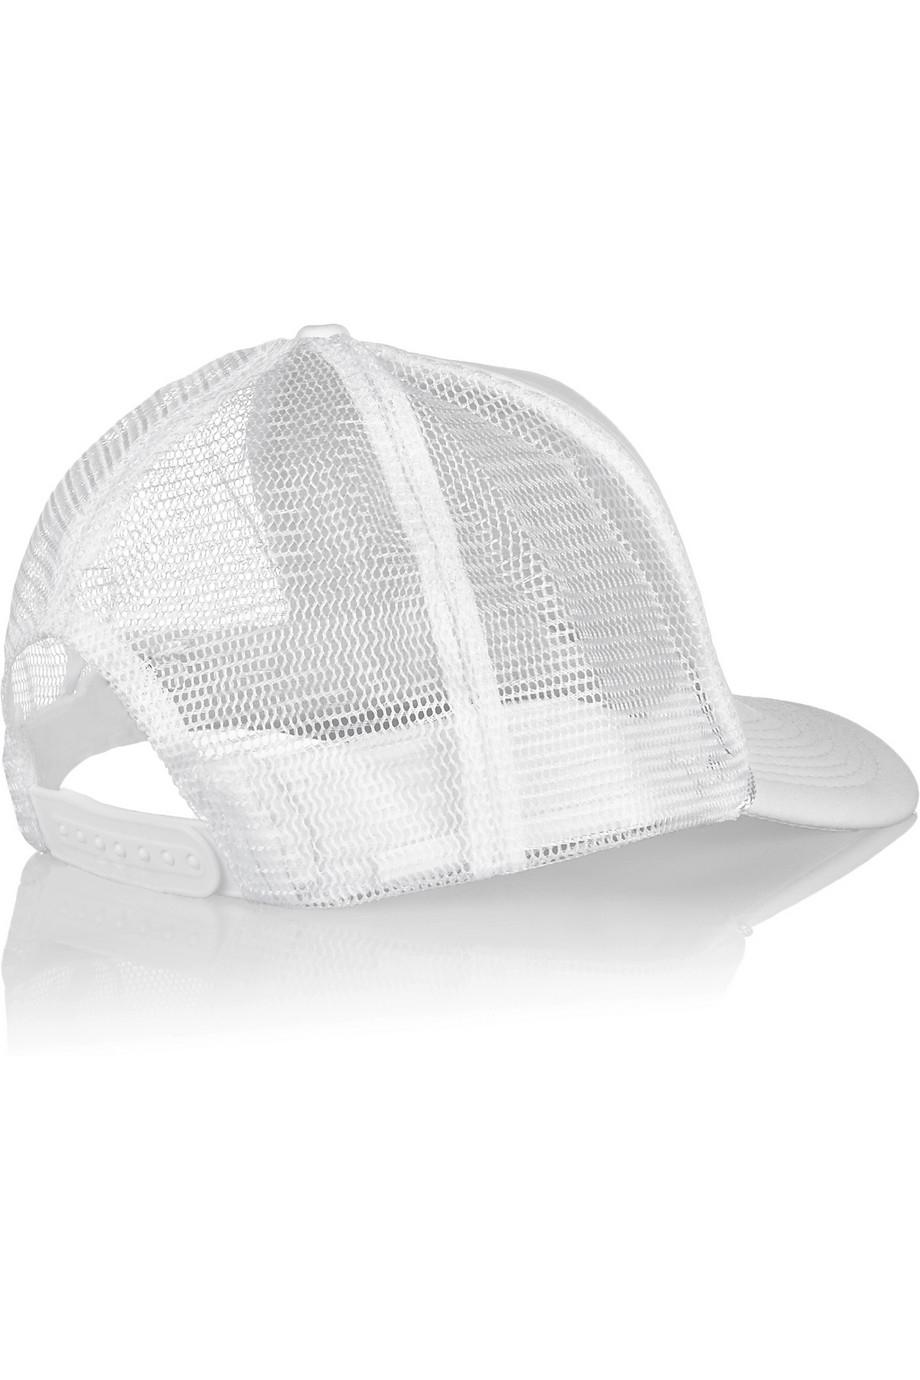 e75d1a14631 Brian Lichtenberg Ballin Embroidered Neoprene And Mesh Cap in White ...